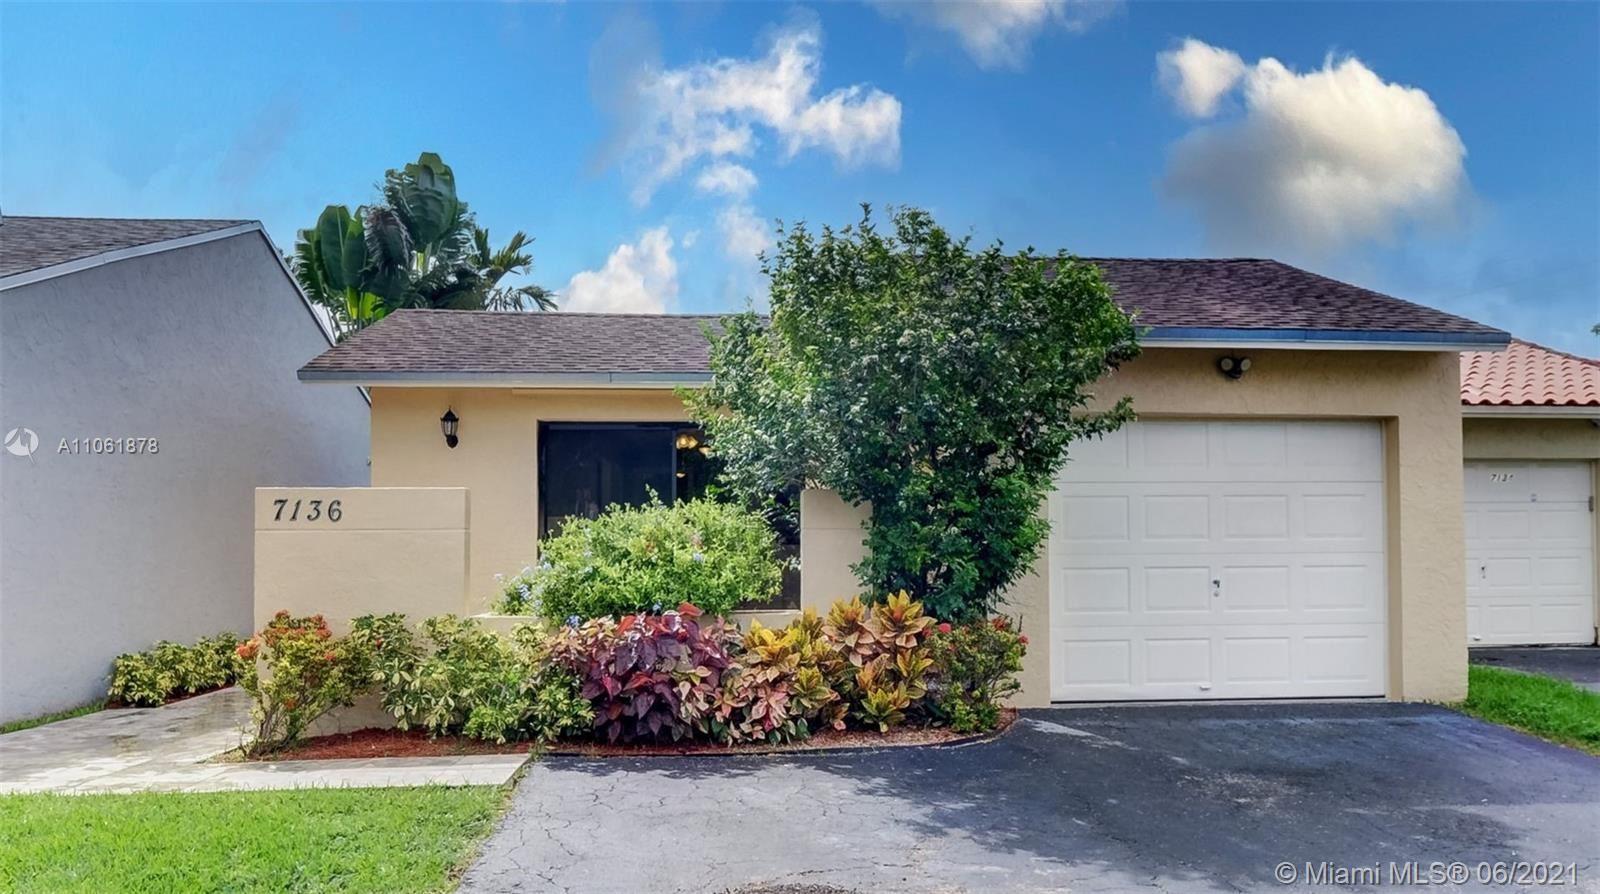 7136 SW 103rd Pl, Miami, FL 33173 - #: A11061878